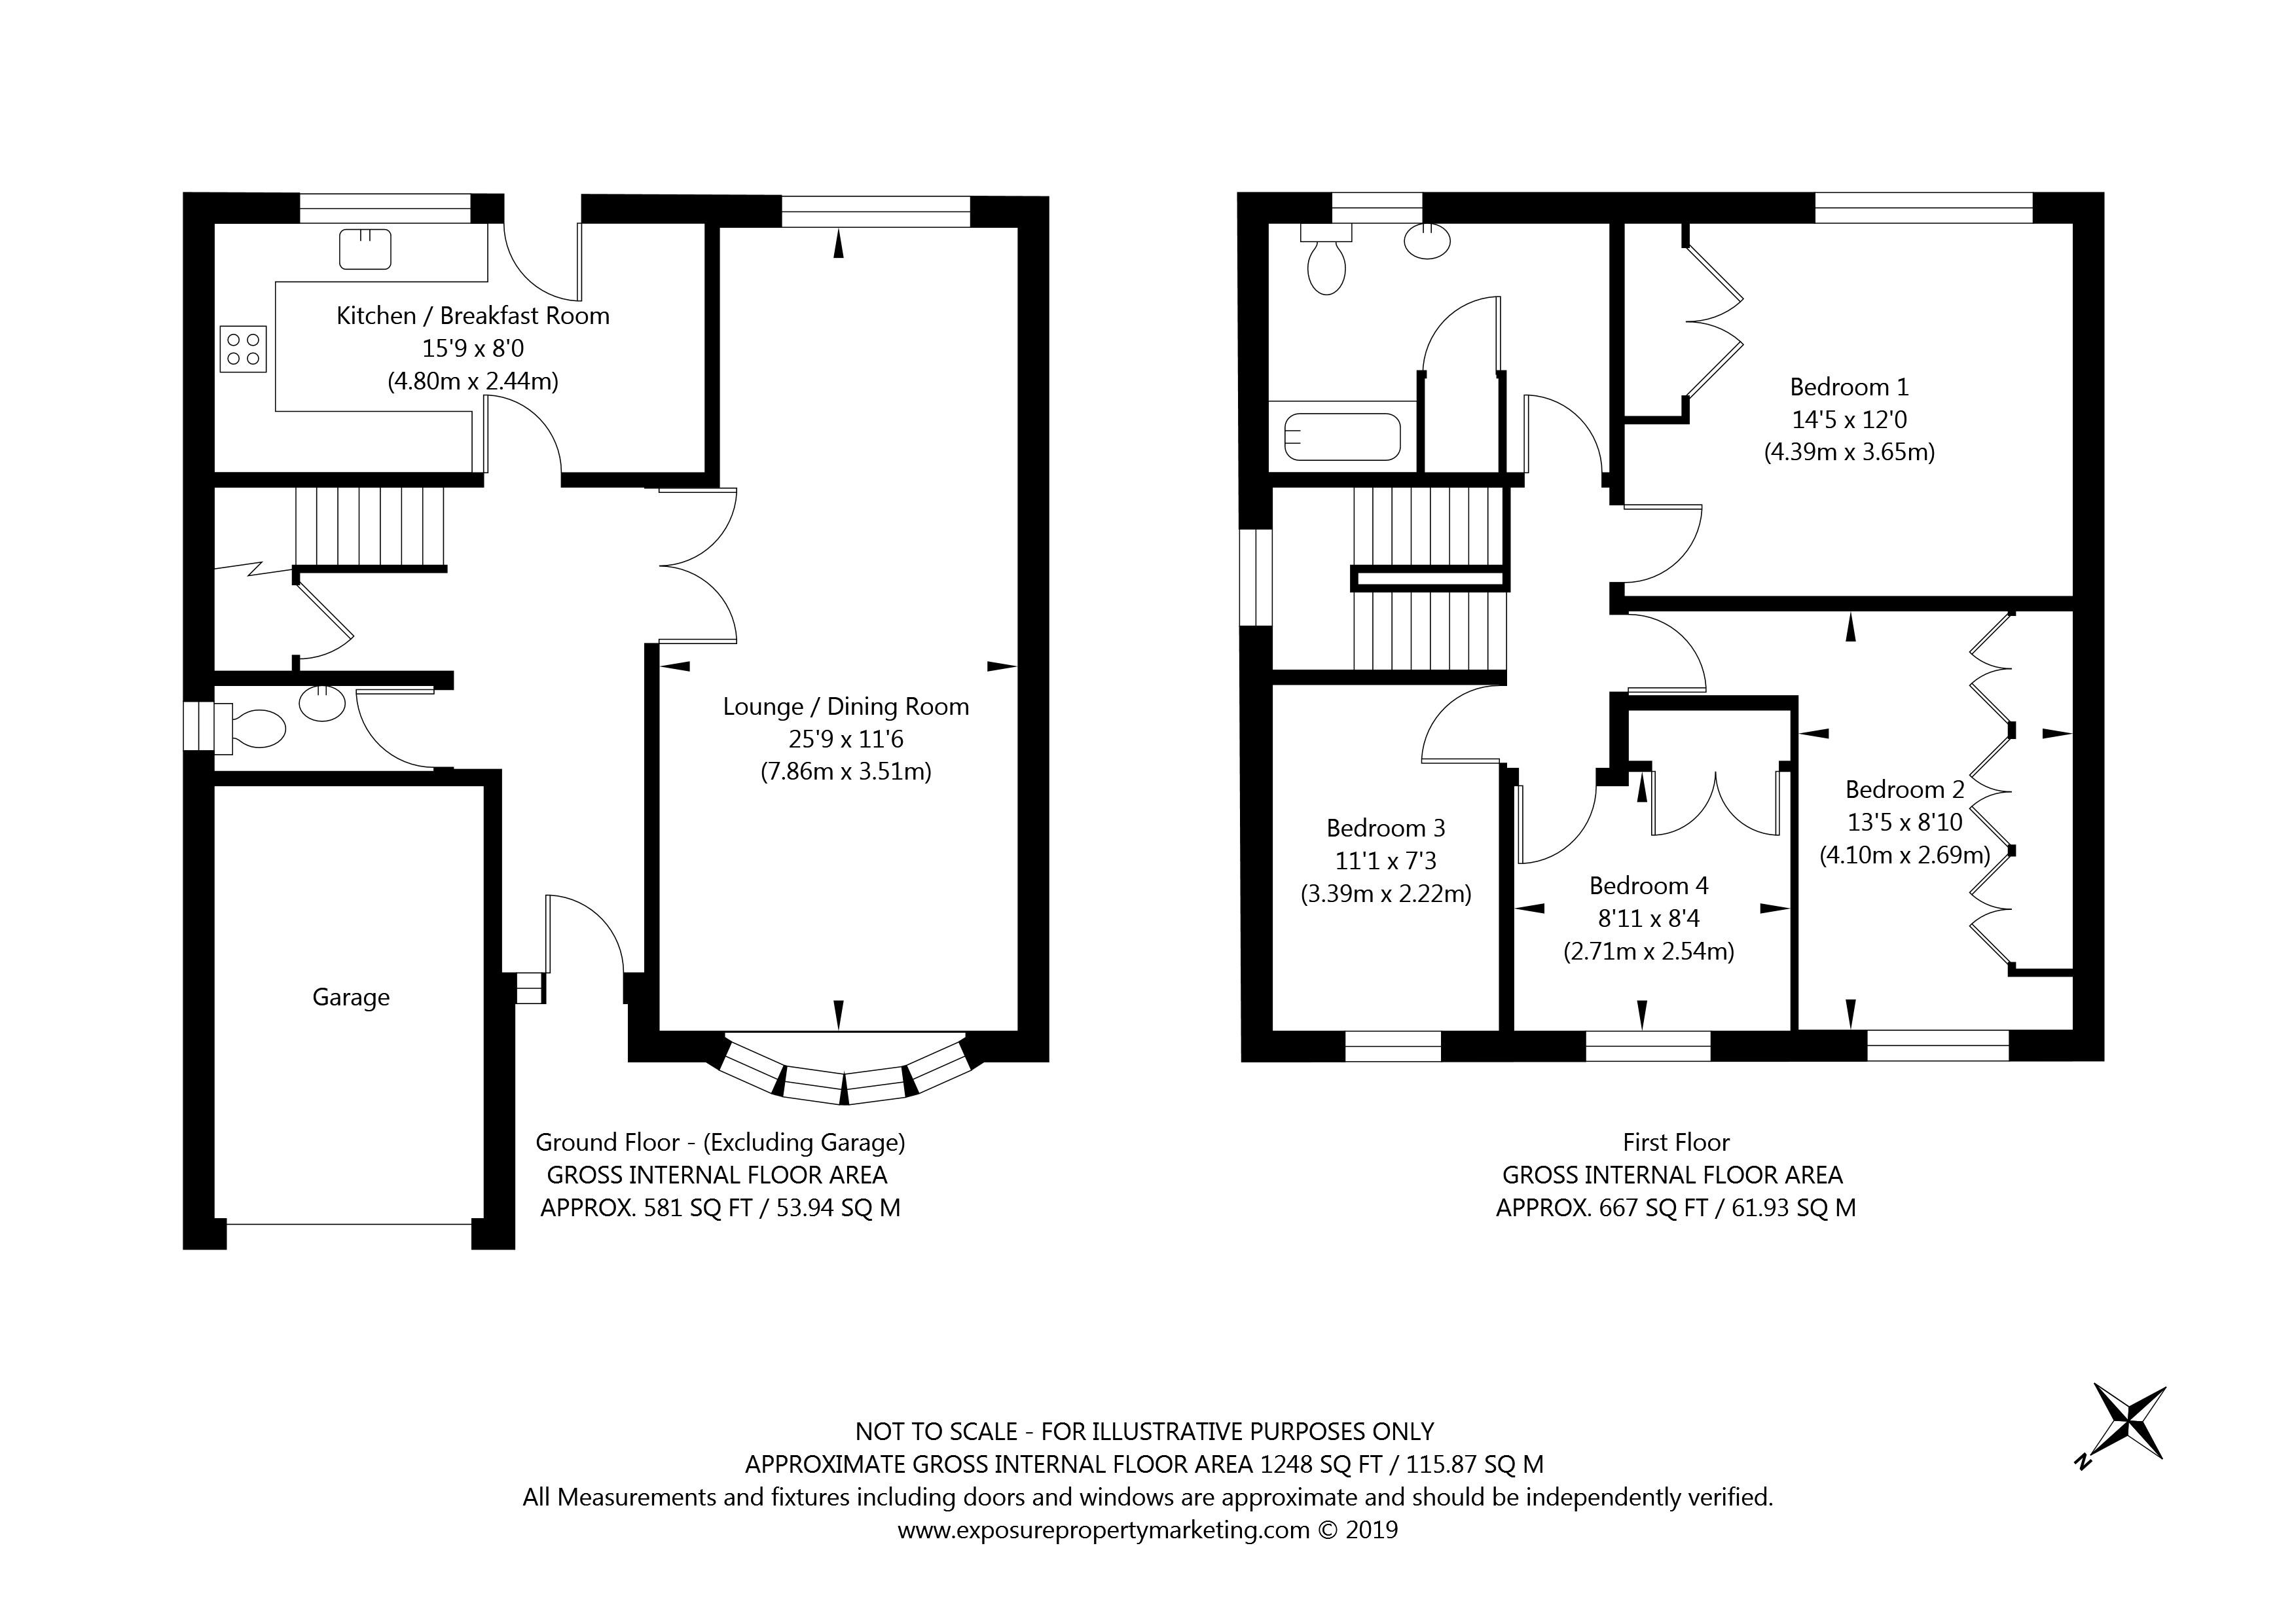 109 Dringthorpe Road, York property floorplan